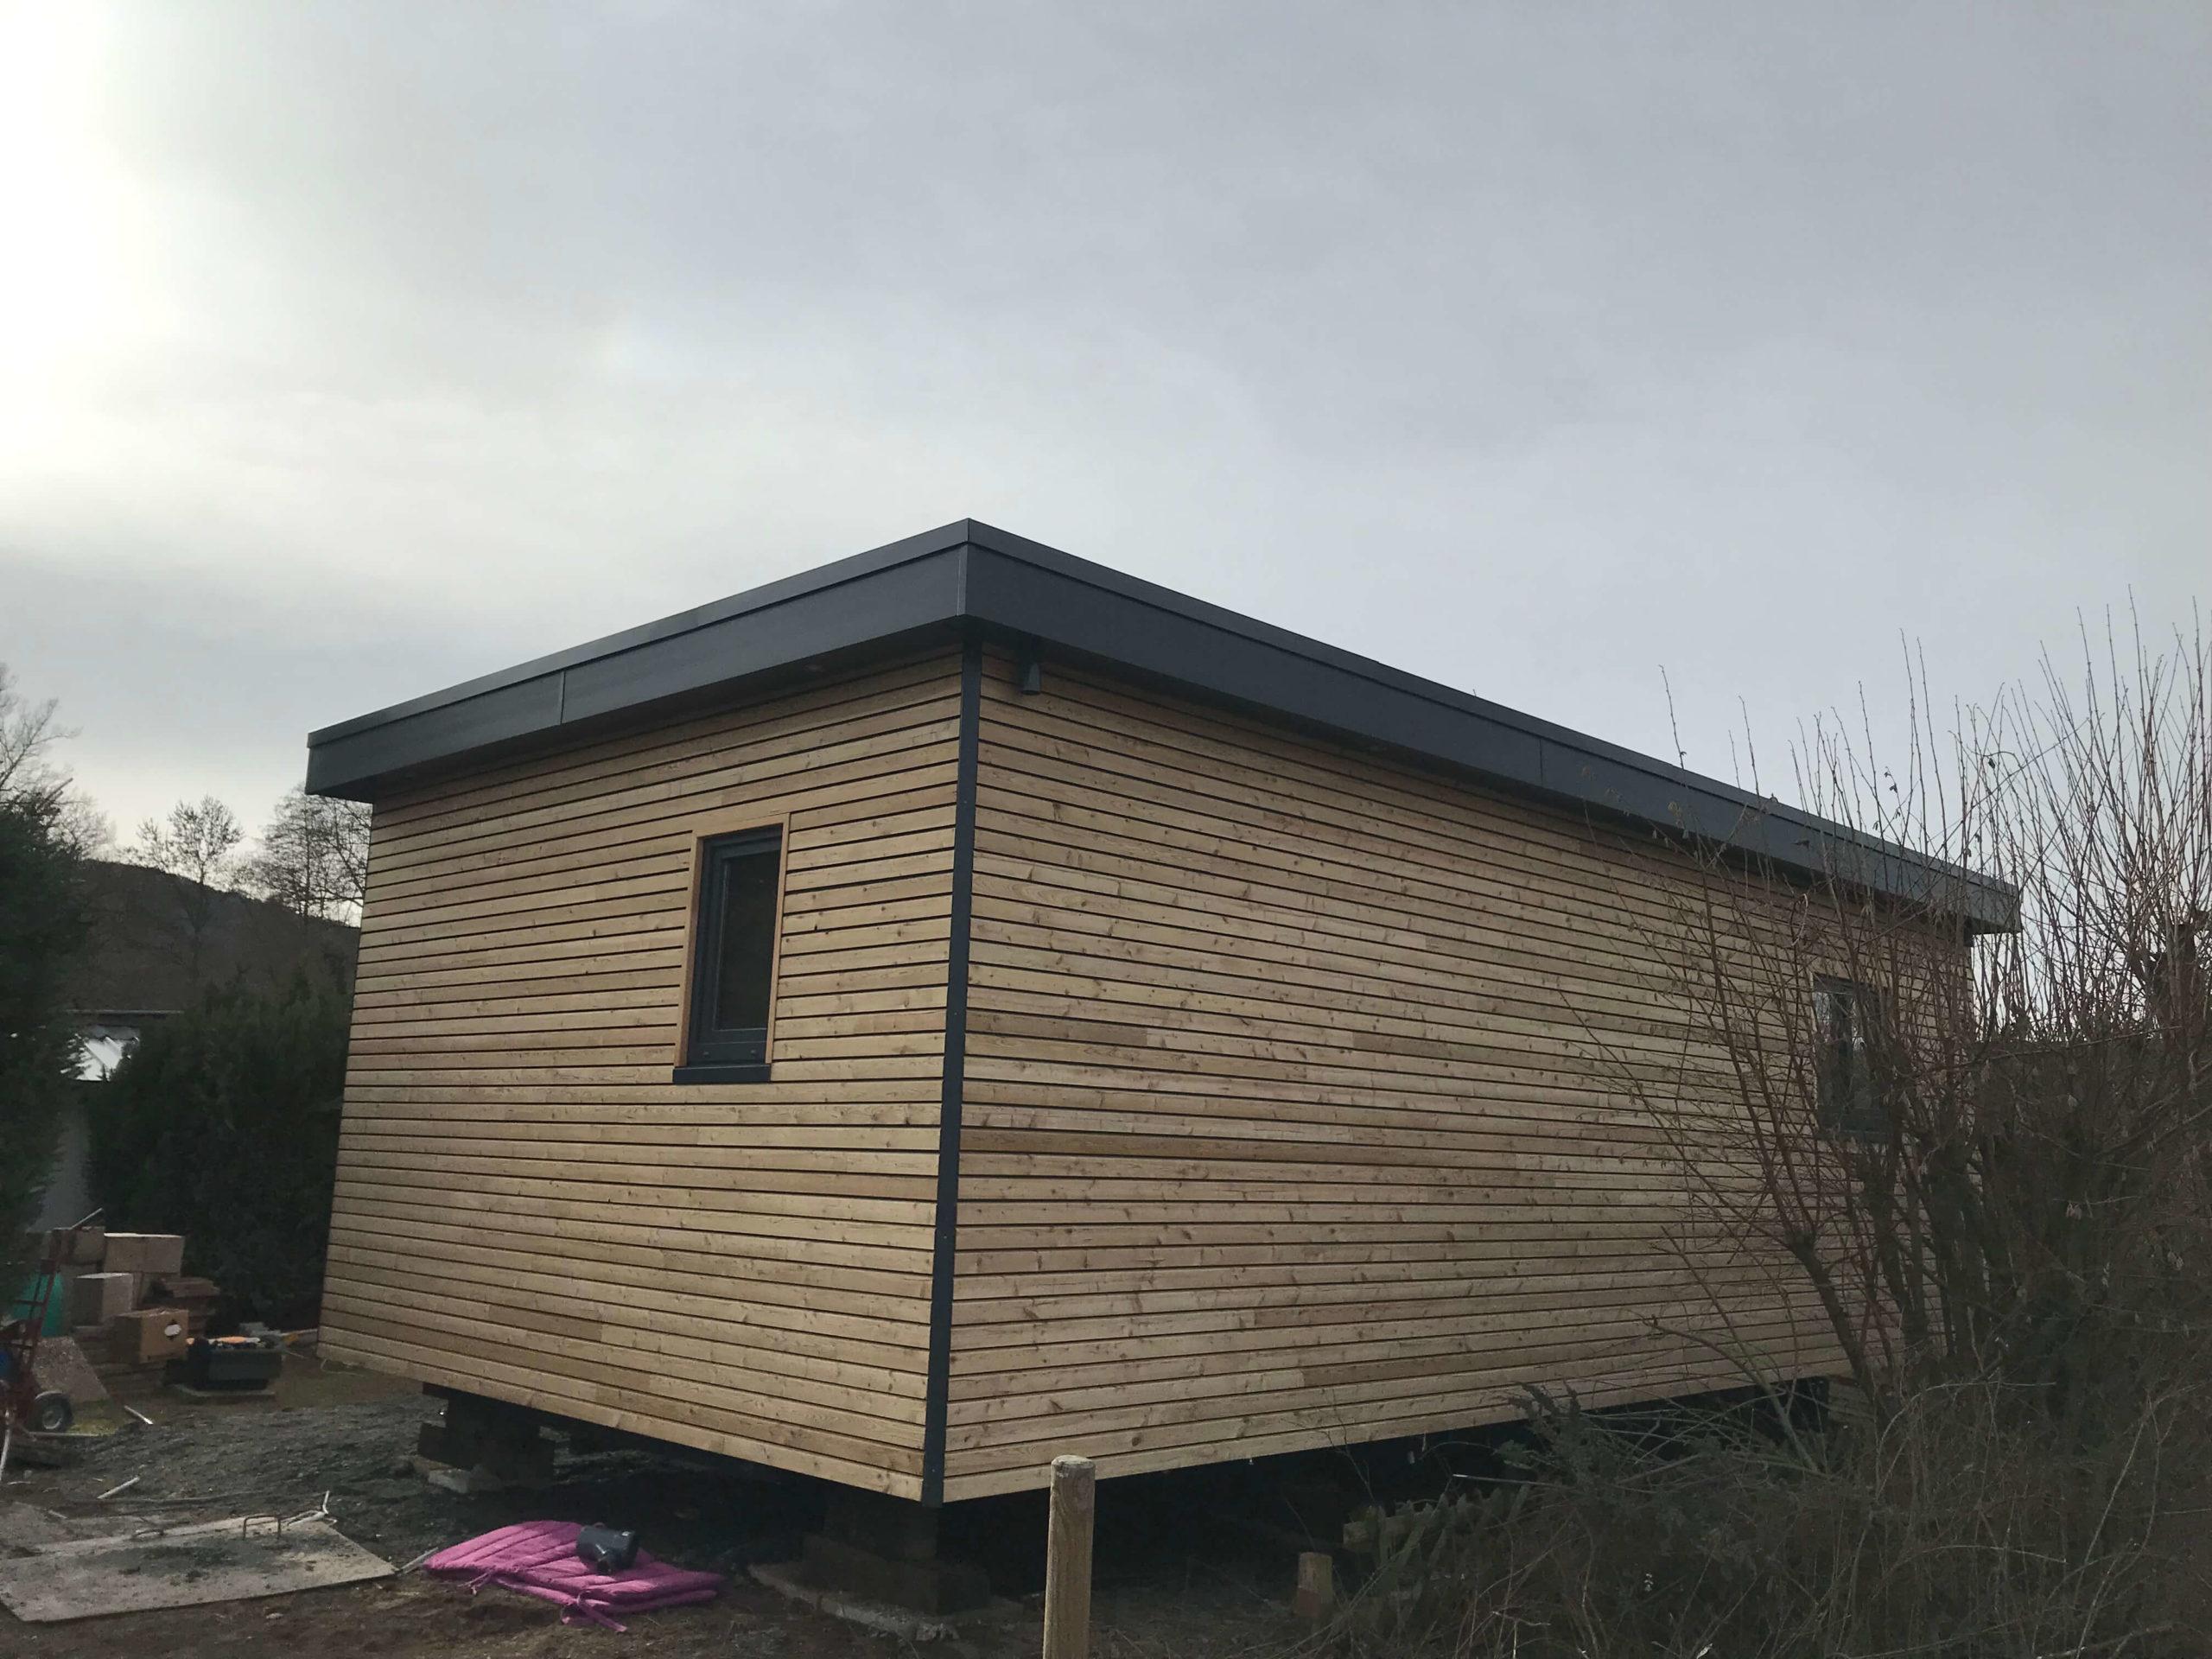 gebautes-chalet-valk-vital-camp-gmbh13